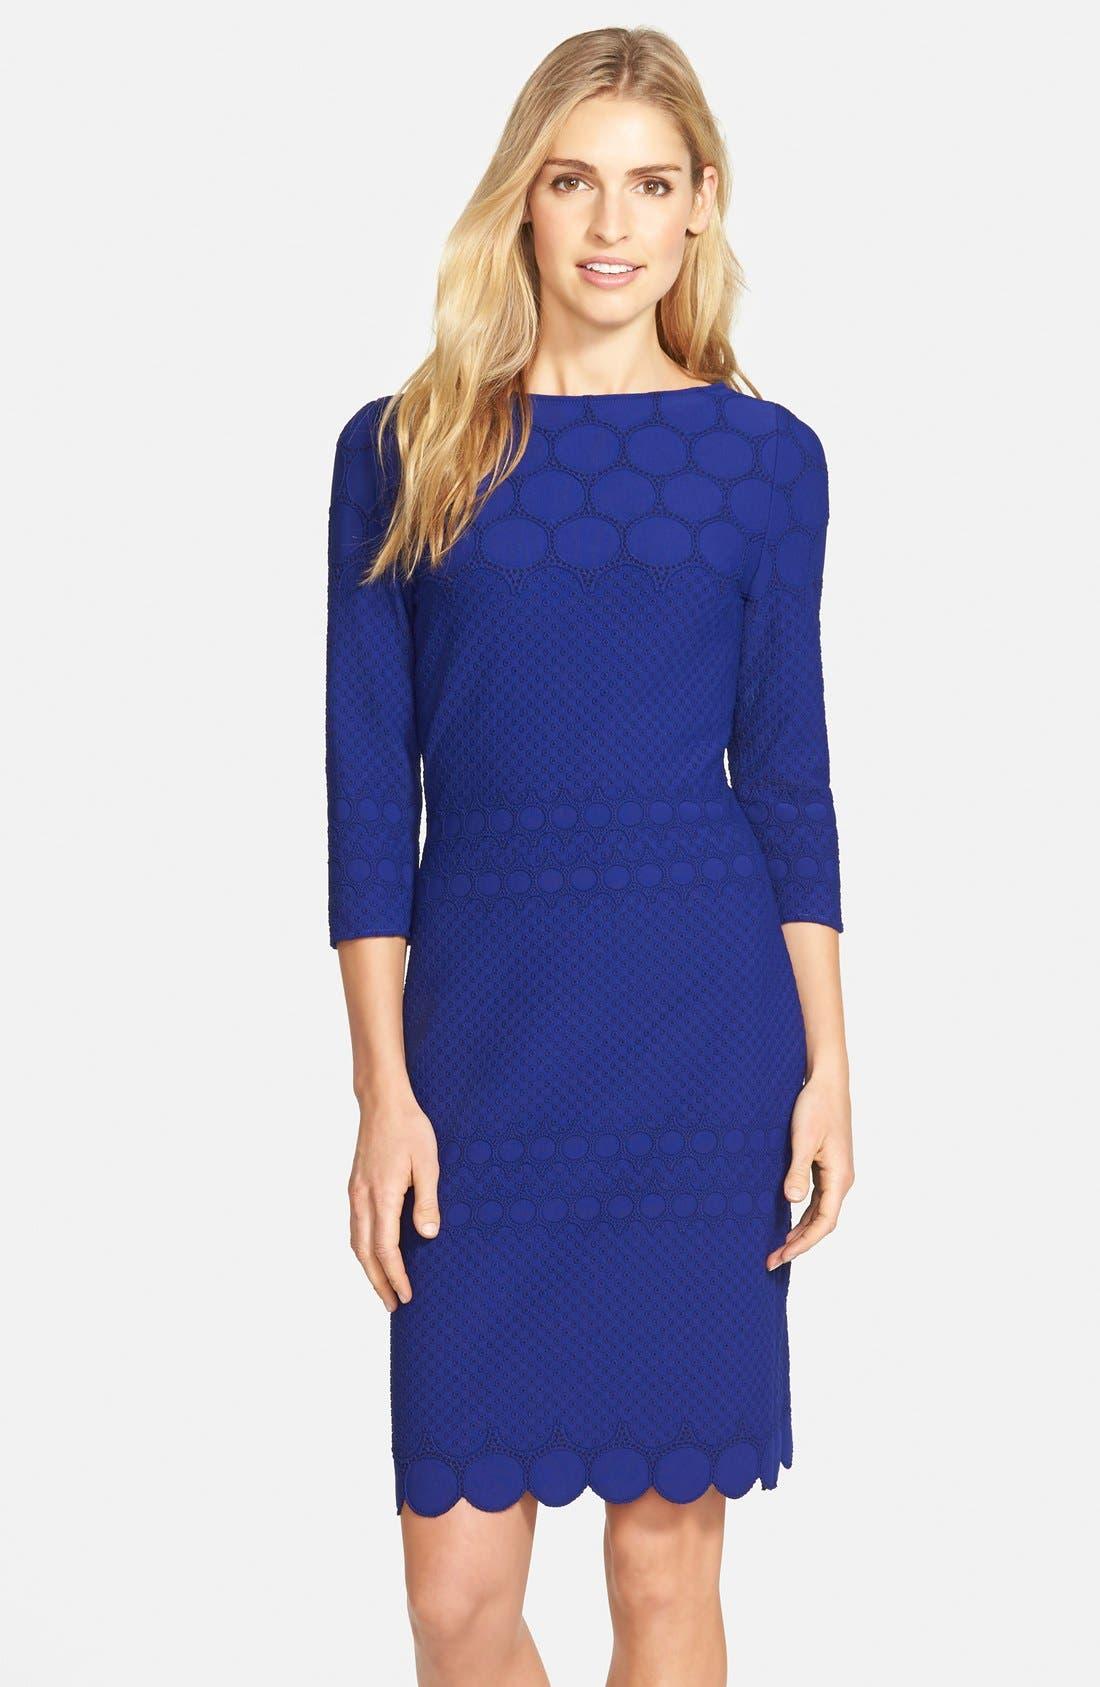 Alternate Image 1 Selected - Julia Jordan Eyelet Sheath Dress (Online Only)